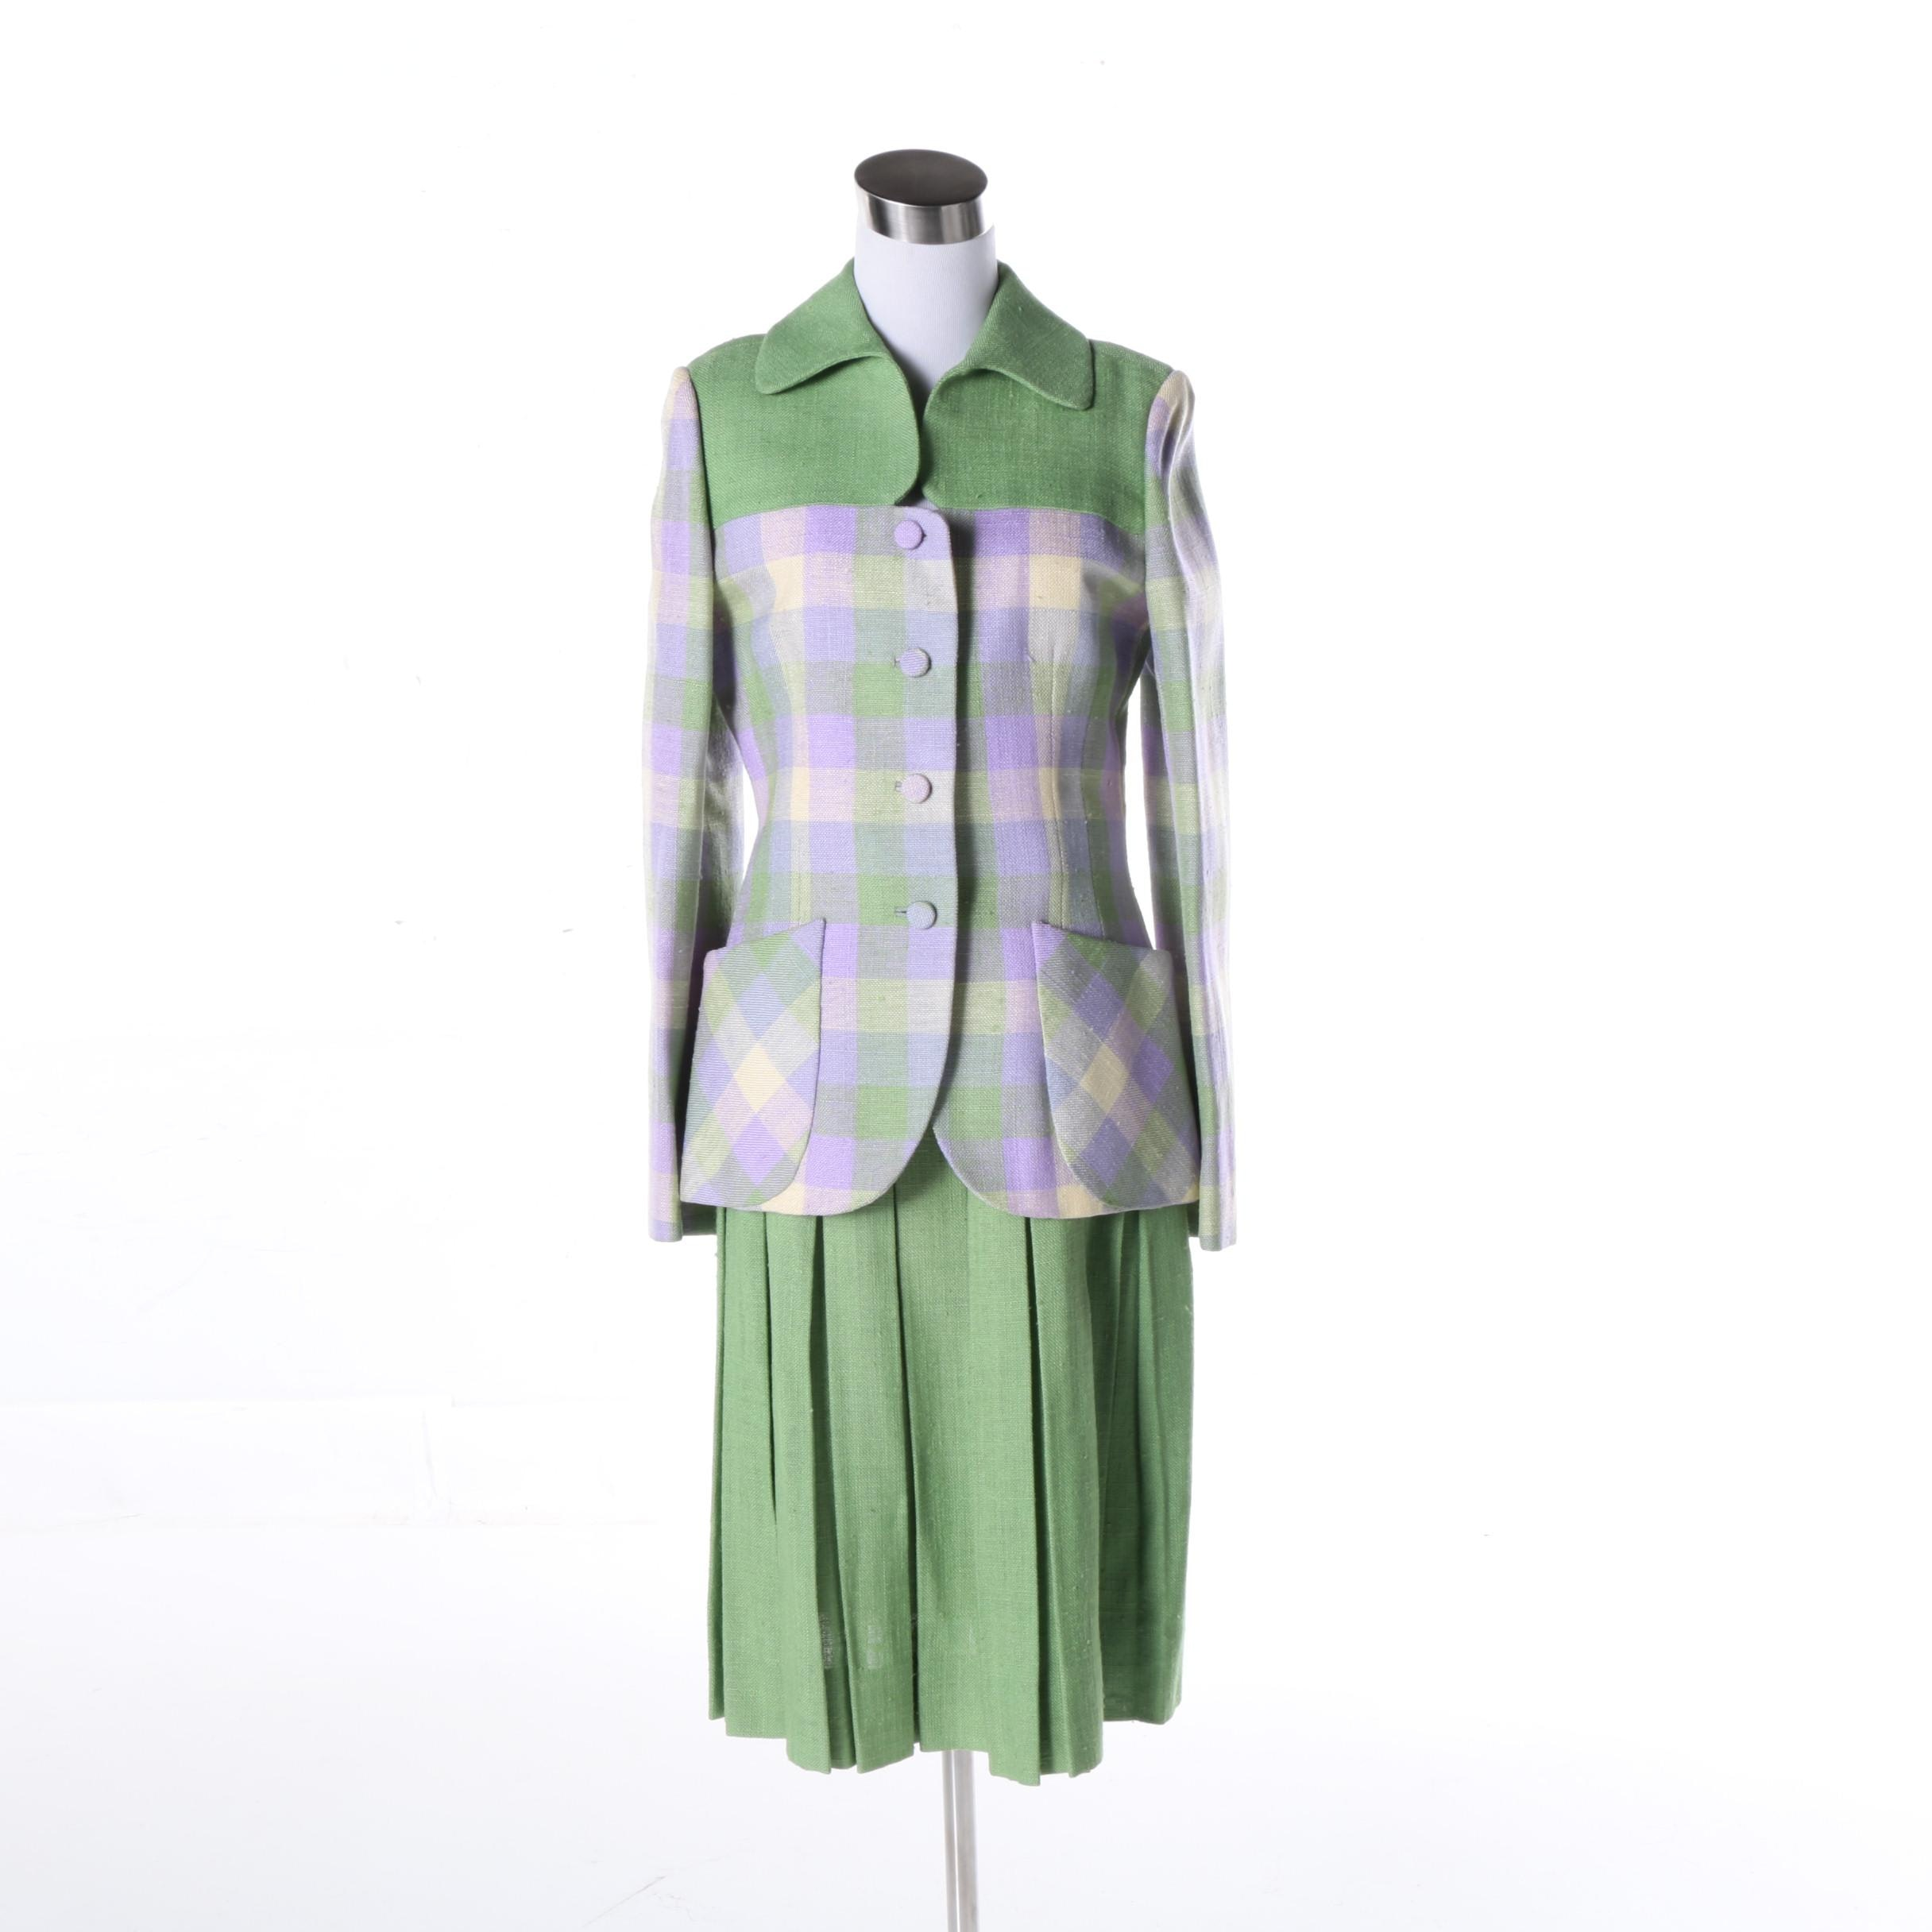 Vintage Cardinali Skirt Suit